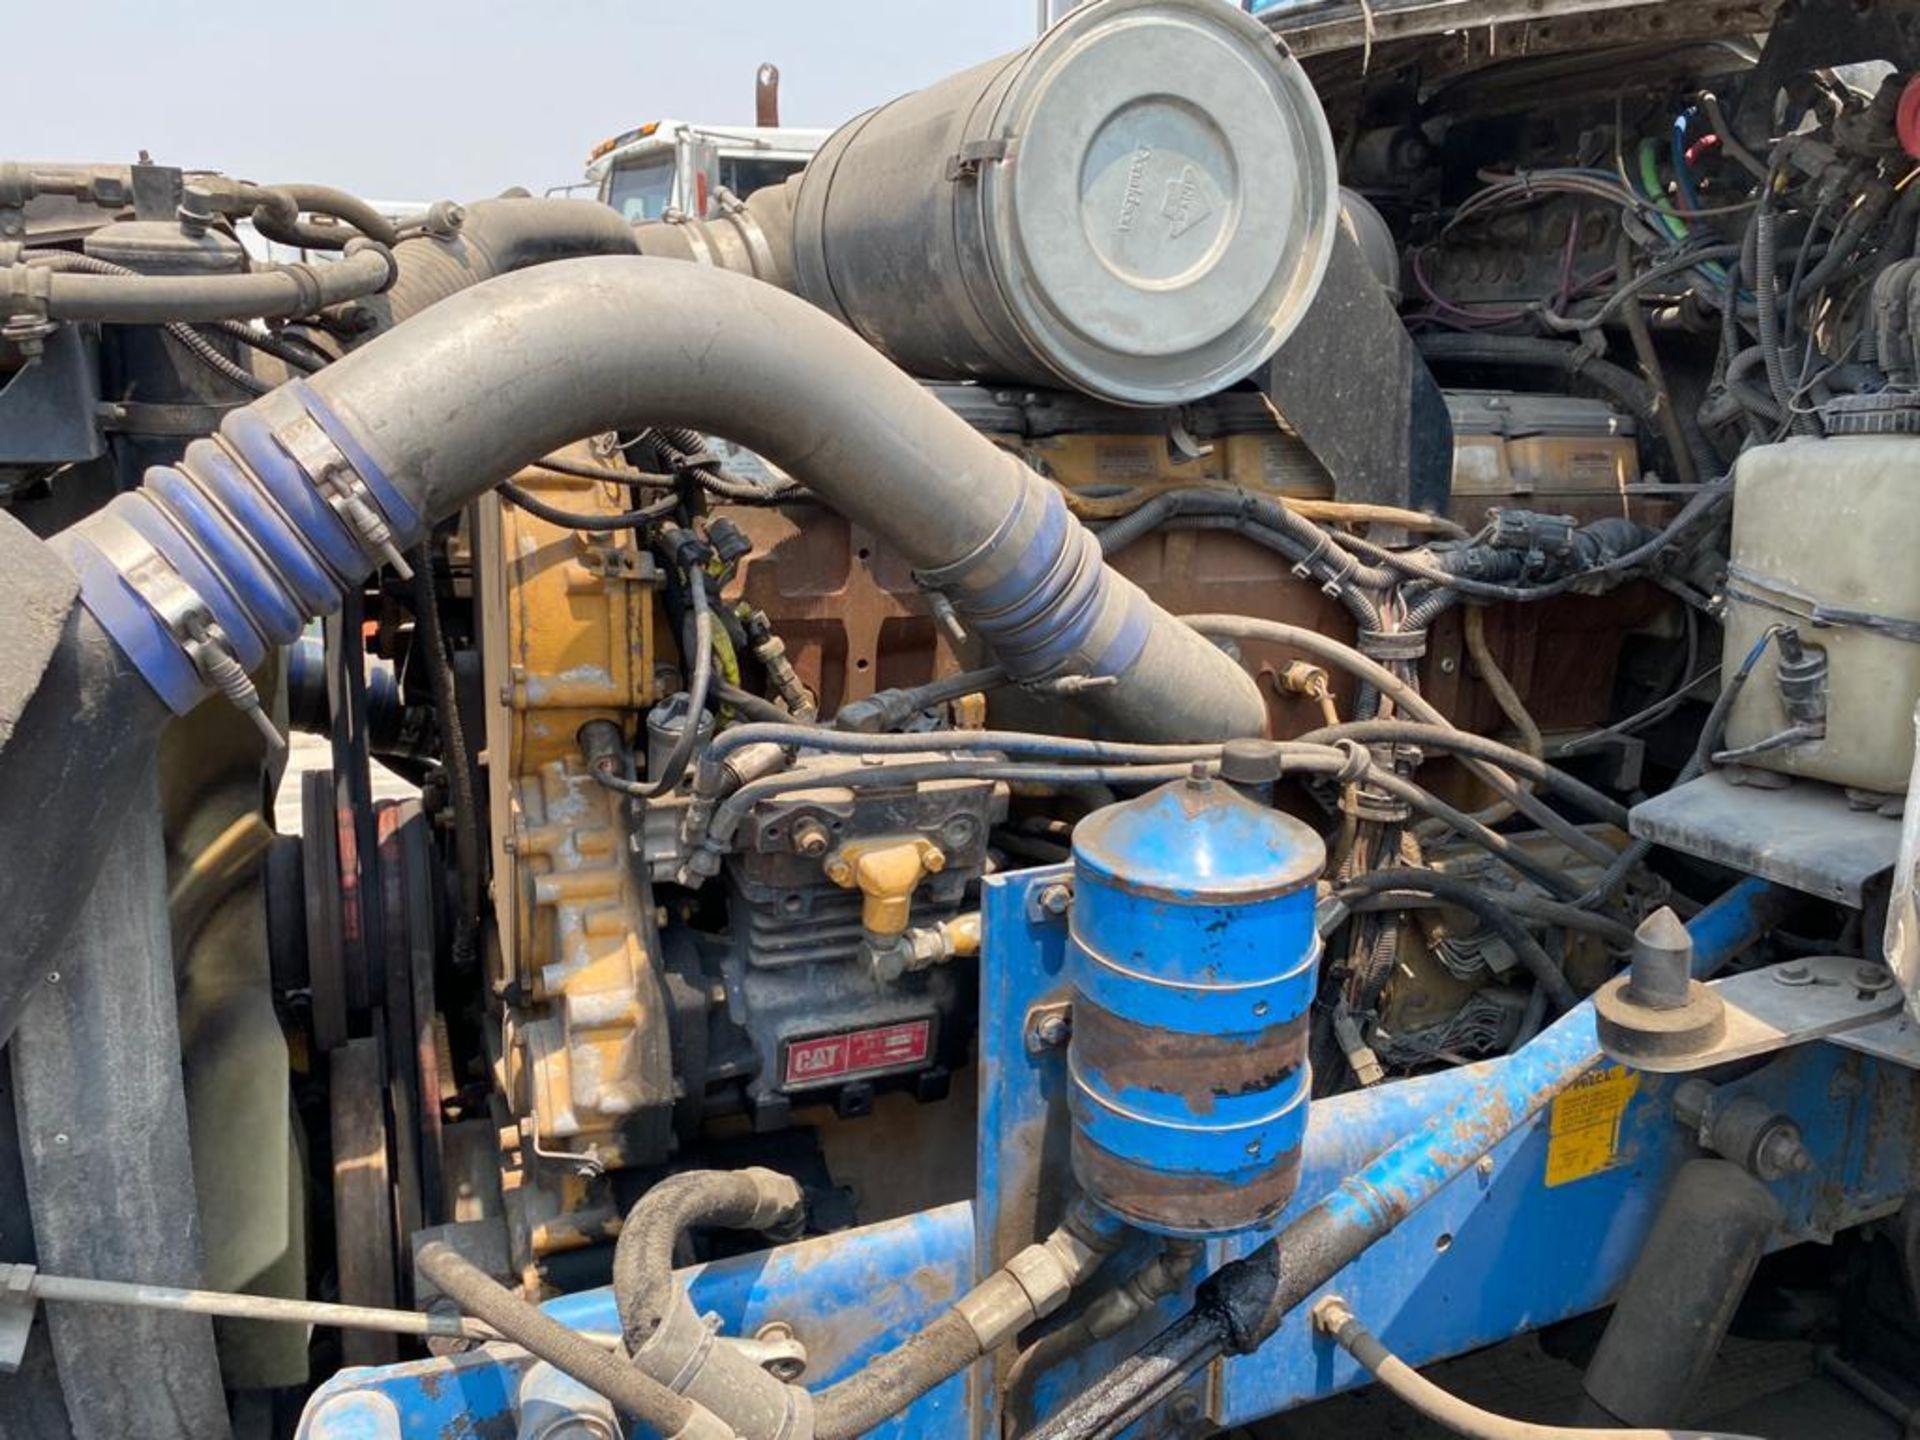 1999 Kenworth Sleeper truck tractor, standard transmission of 18 speeds - Image 55 of 70